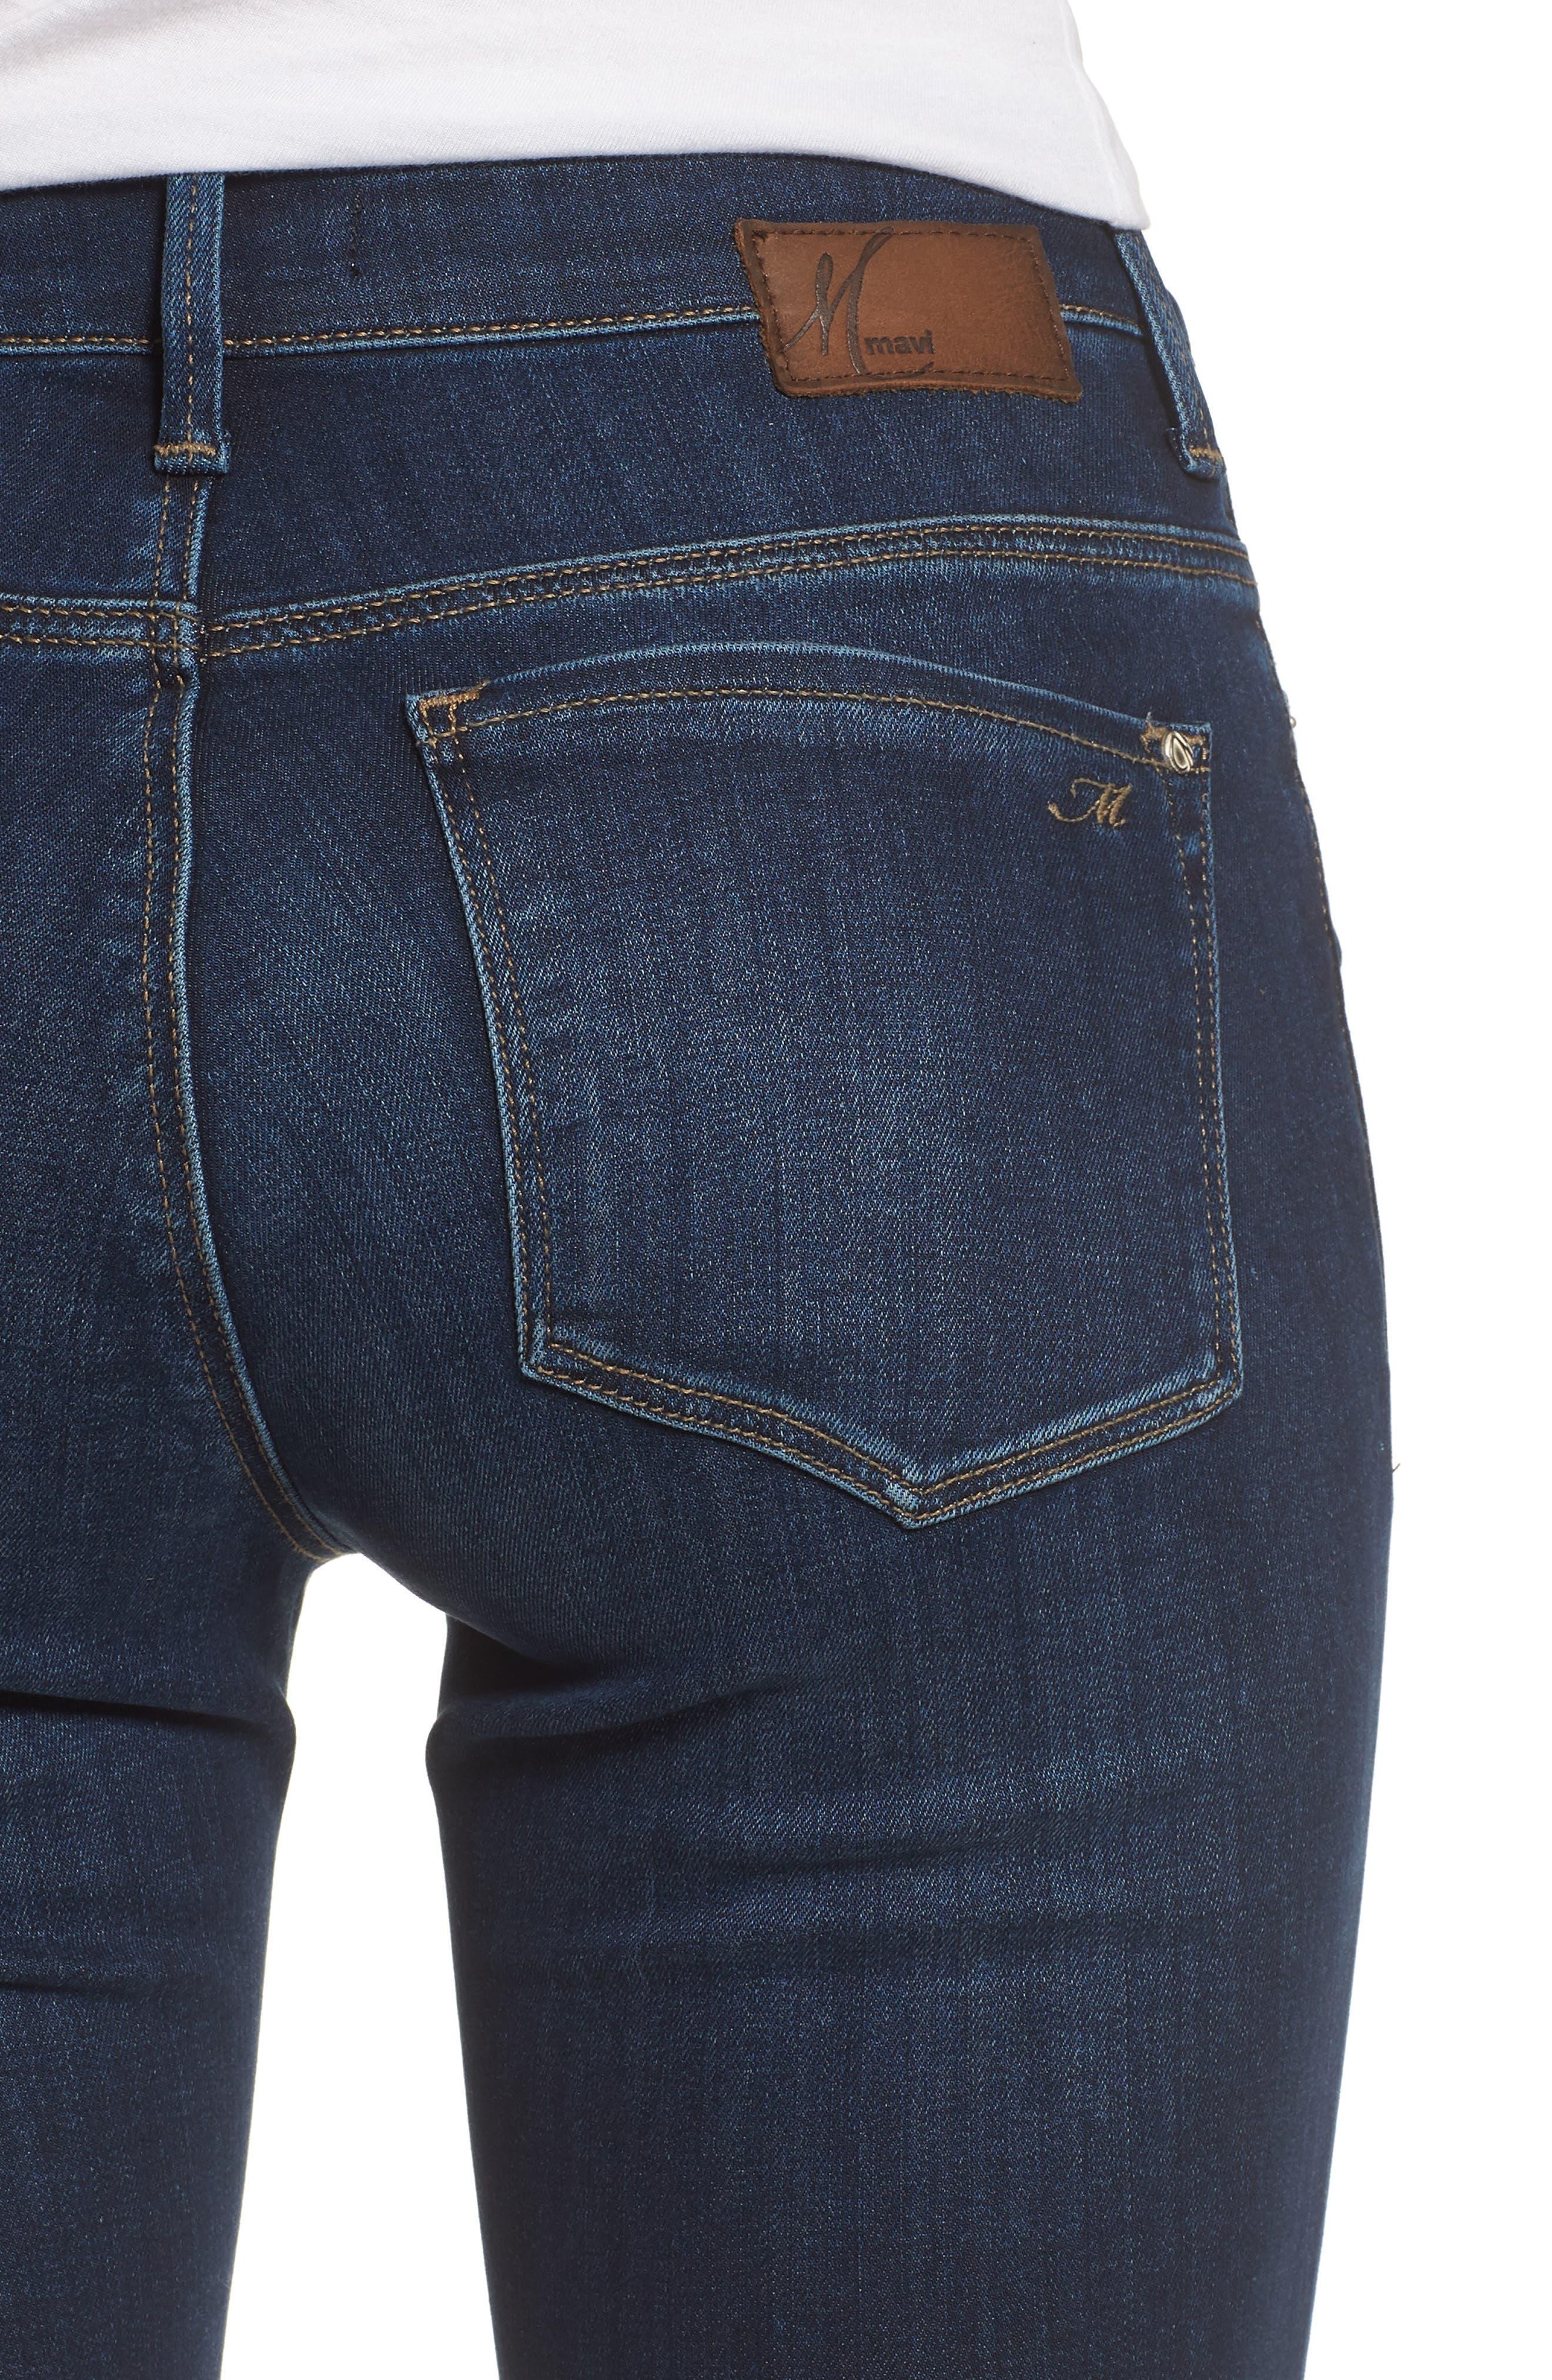 Alissa Skinny Jeans,                             Alternate thumbnail 4, color,                             400